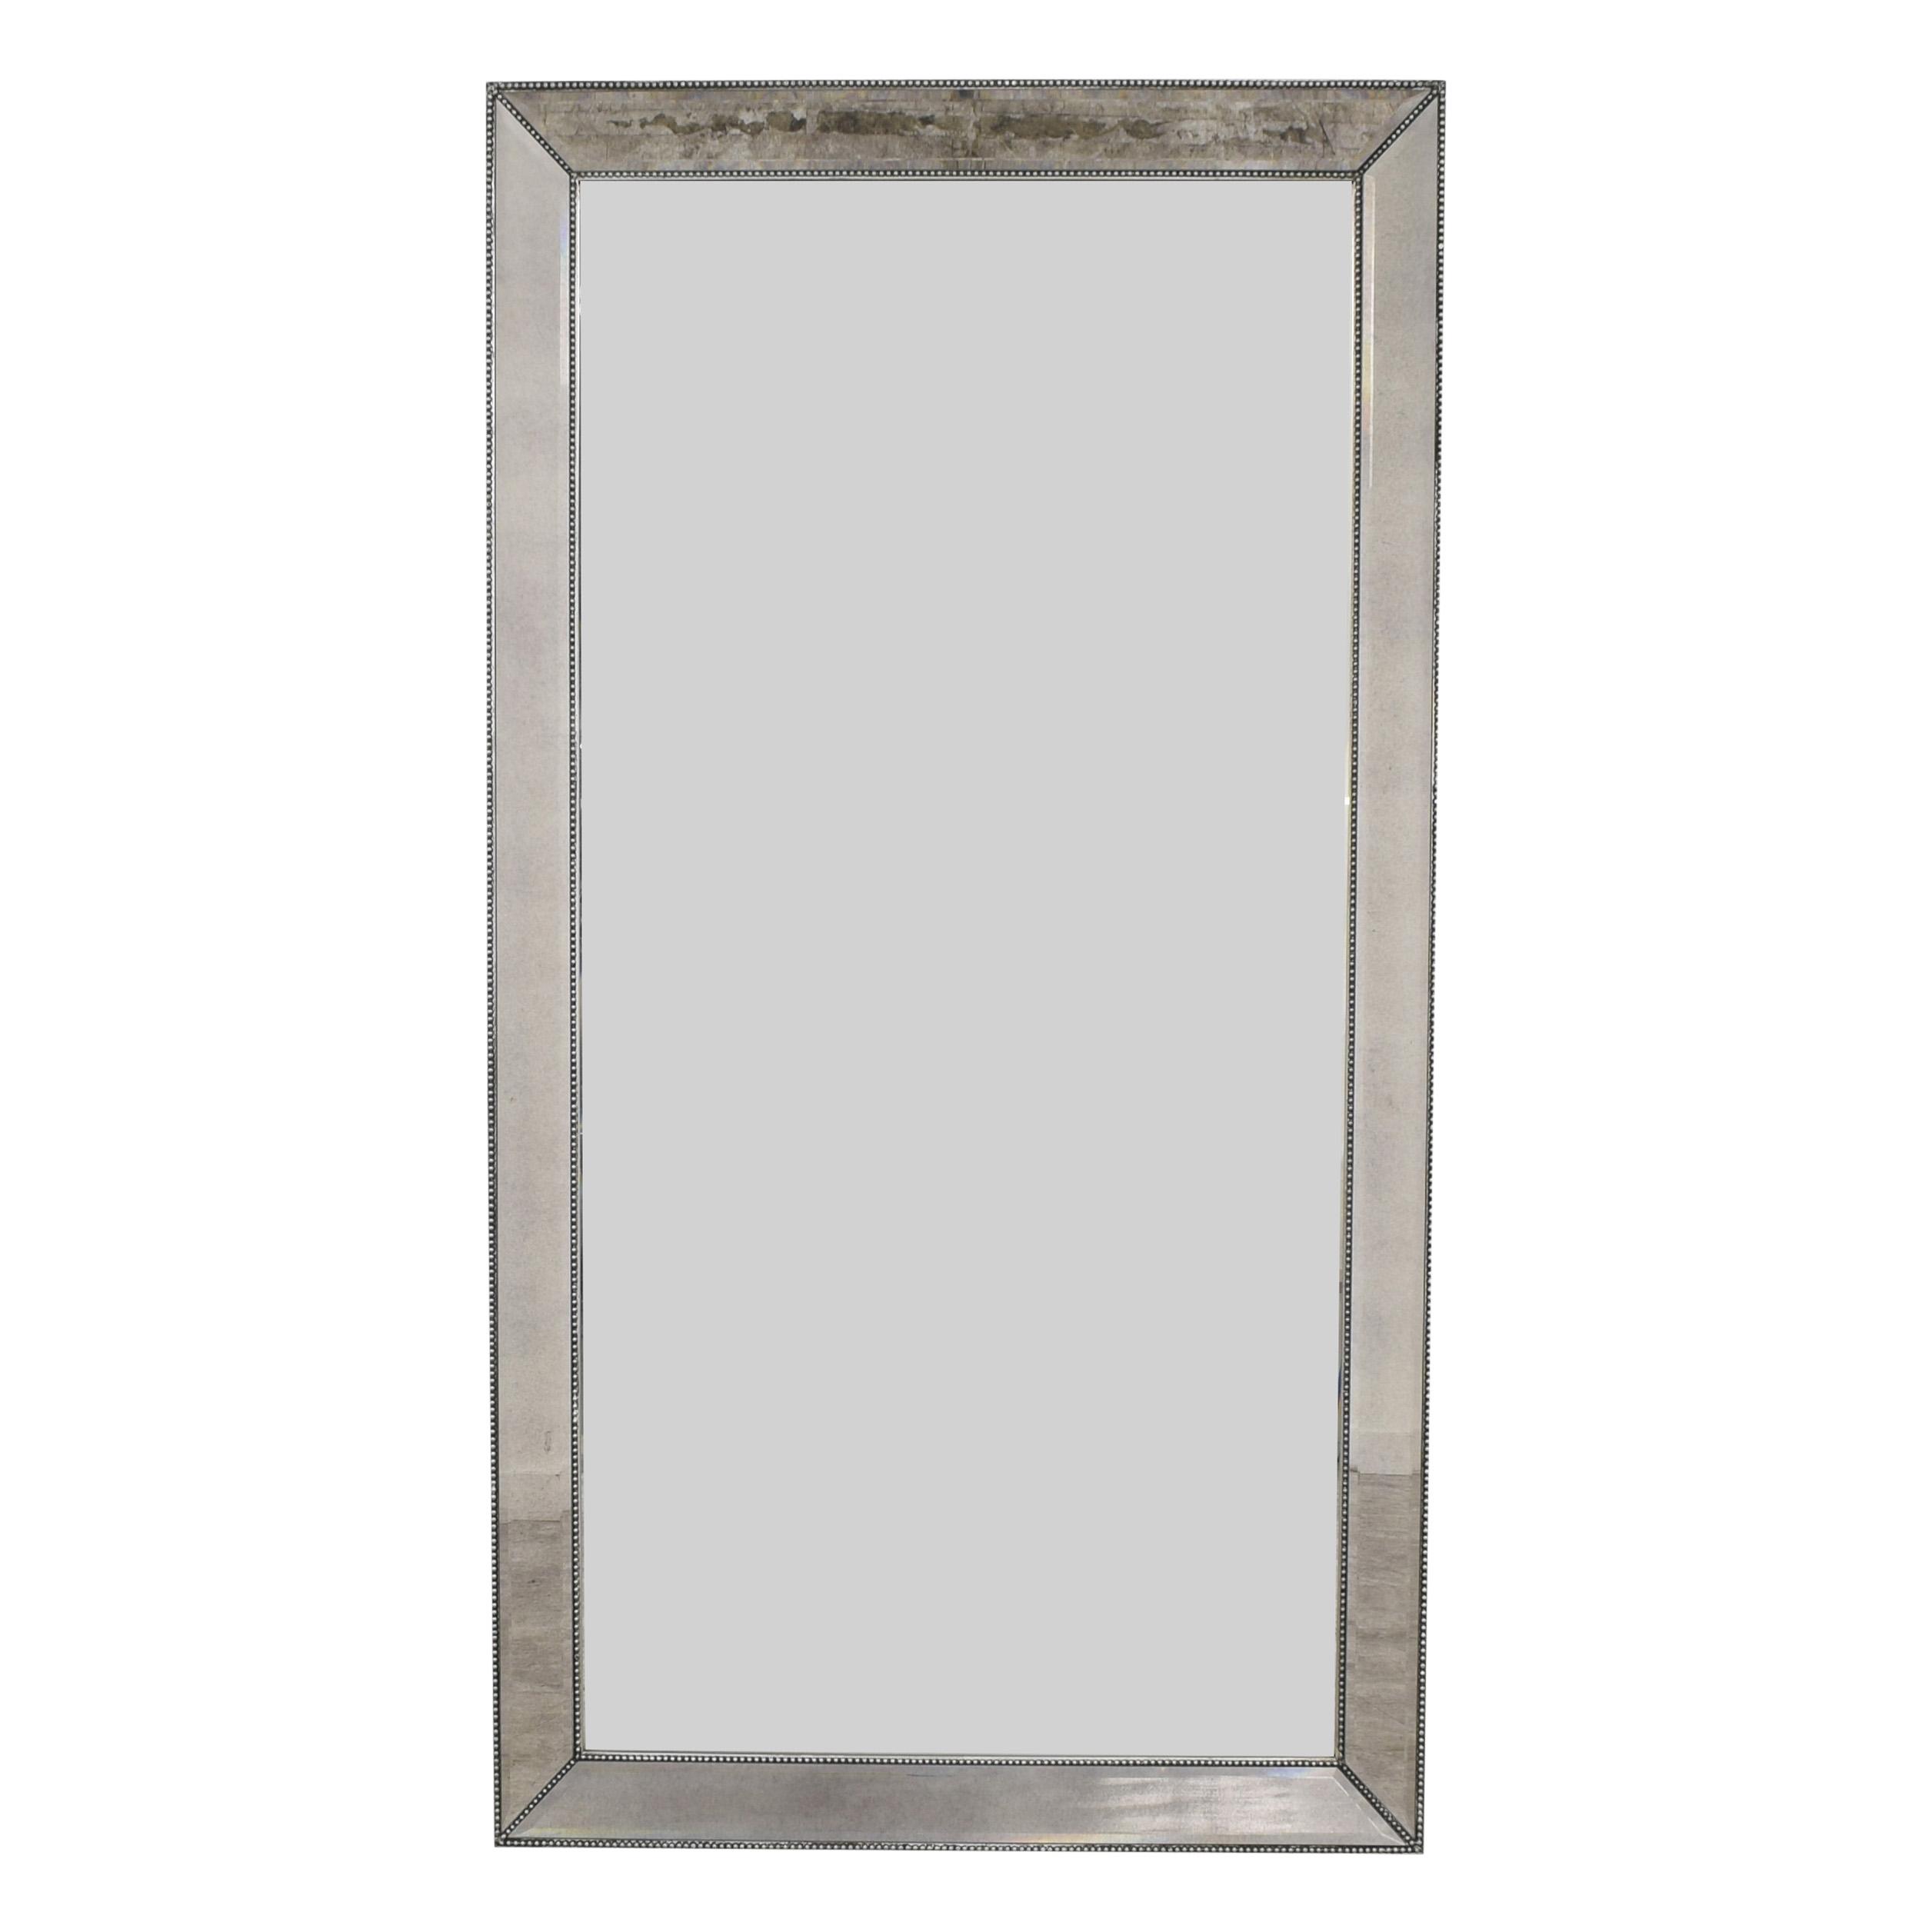 Macy's Macy's Marais Mirrored Floor Mirror silver